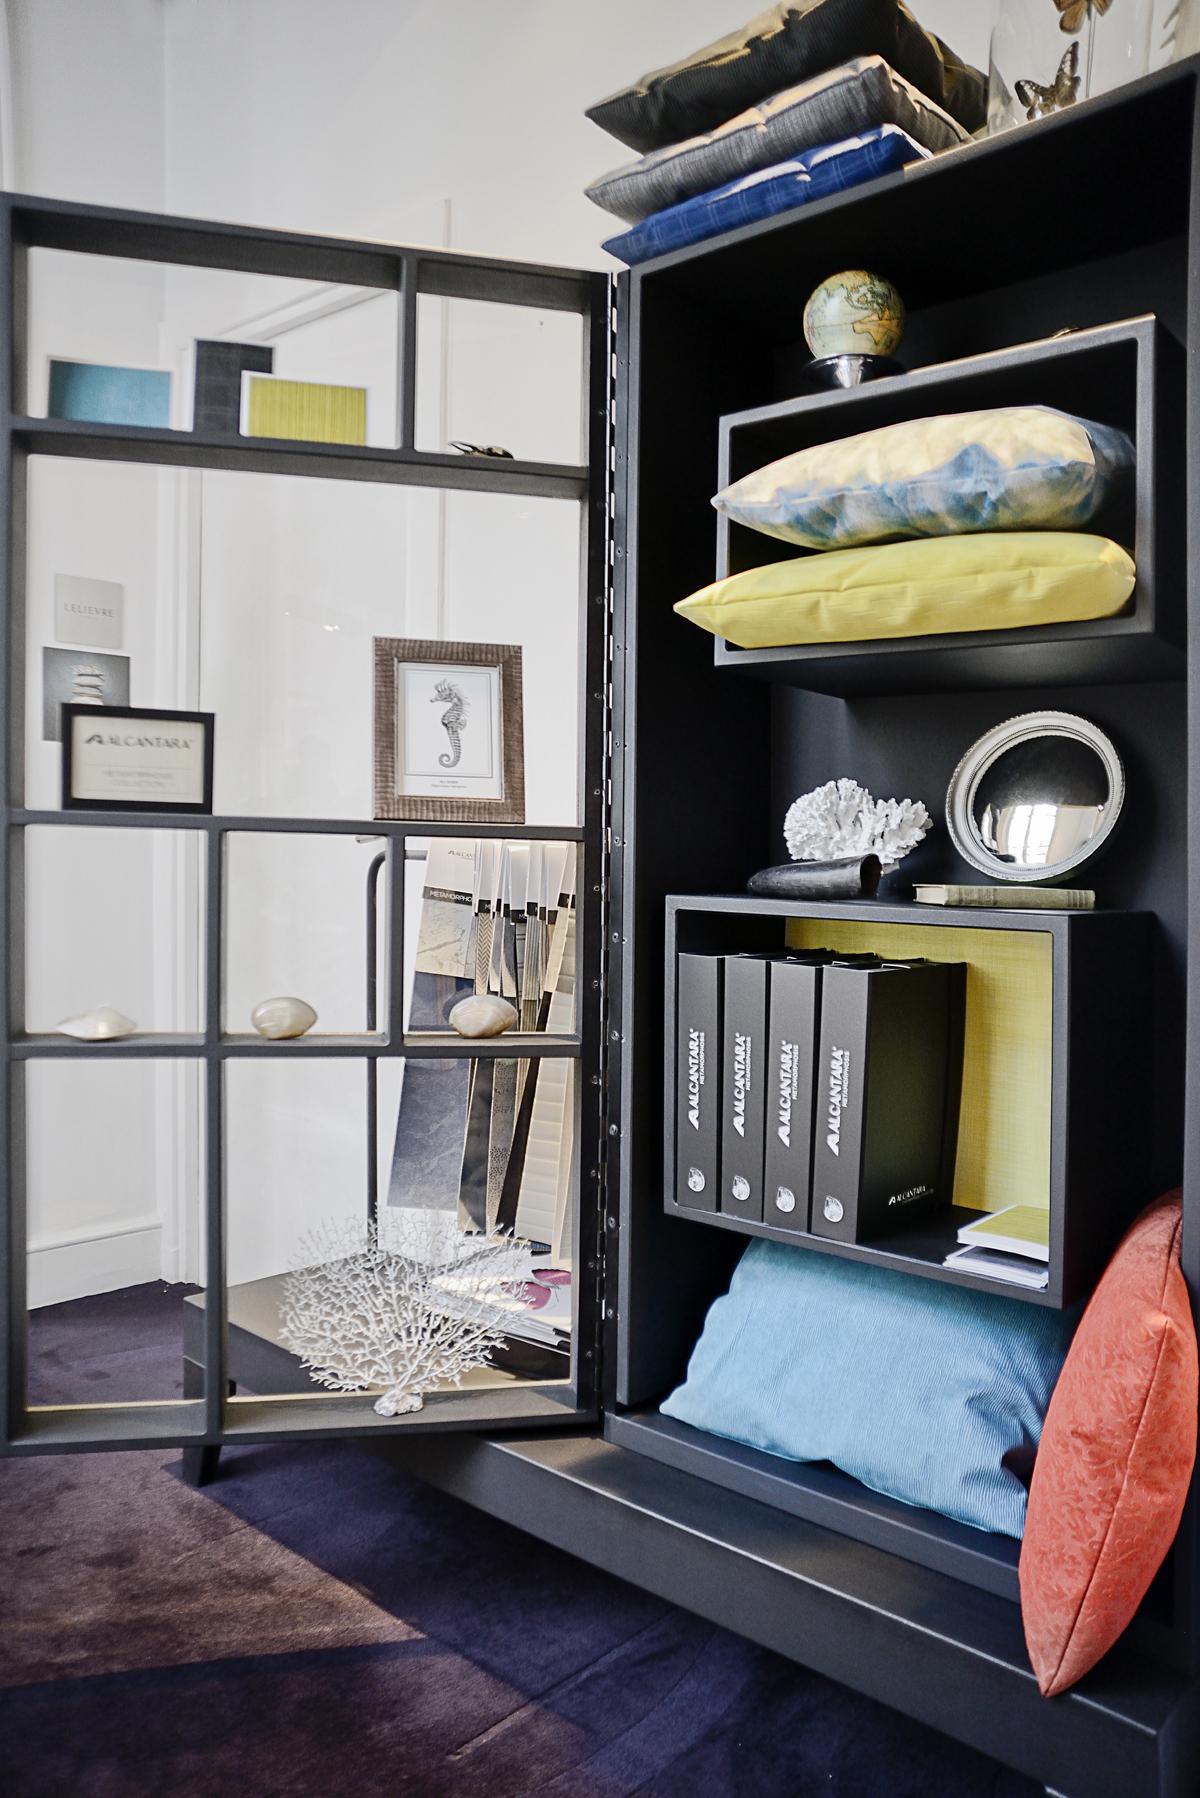 majotik agence de cr ation fabrication sur mesure. Black Bedroom Furniture Sets. Home Design Ideas